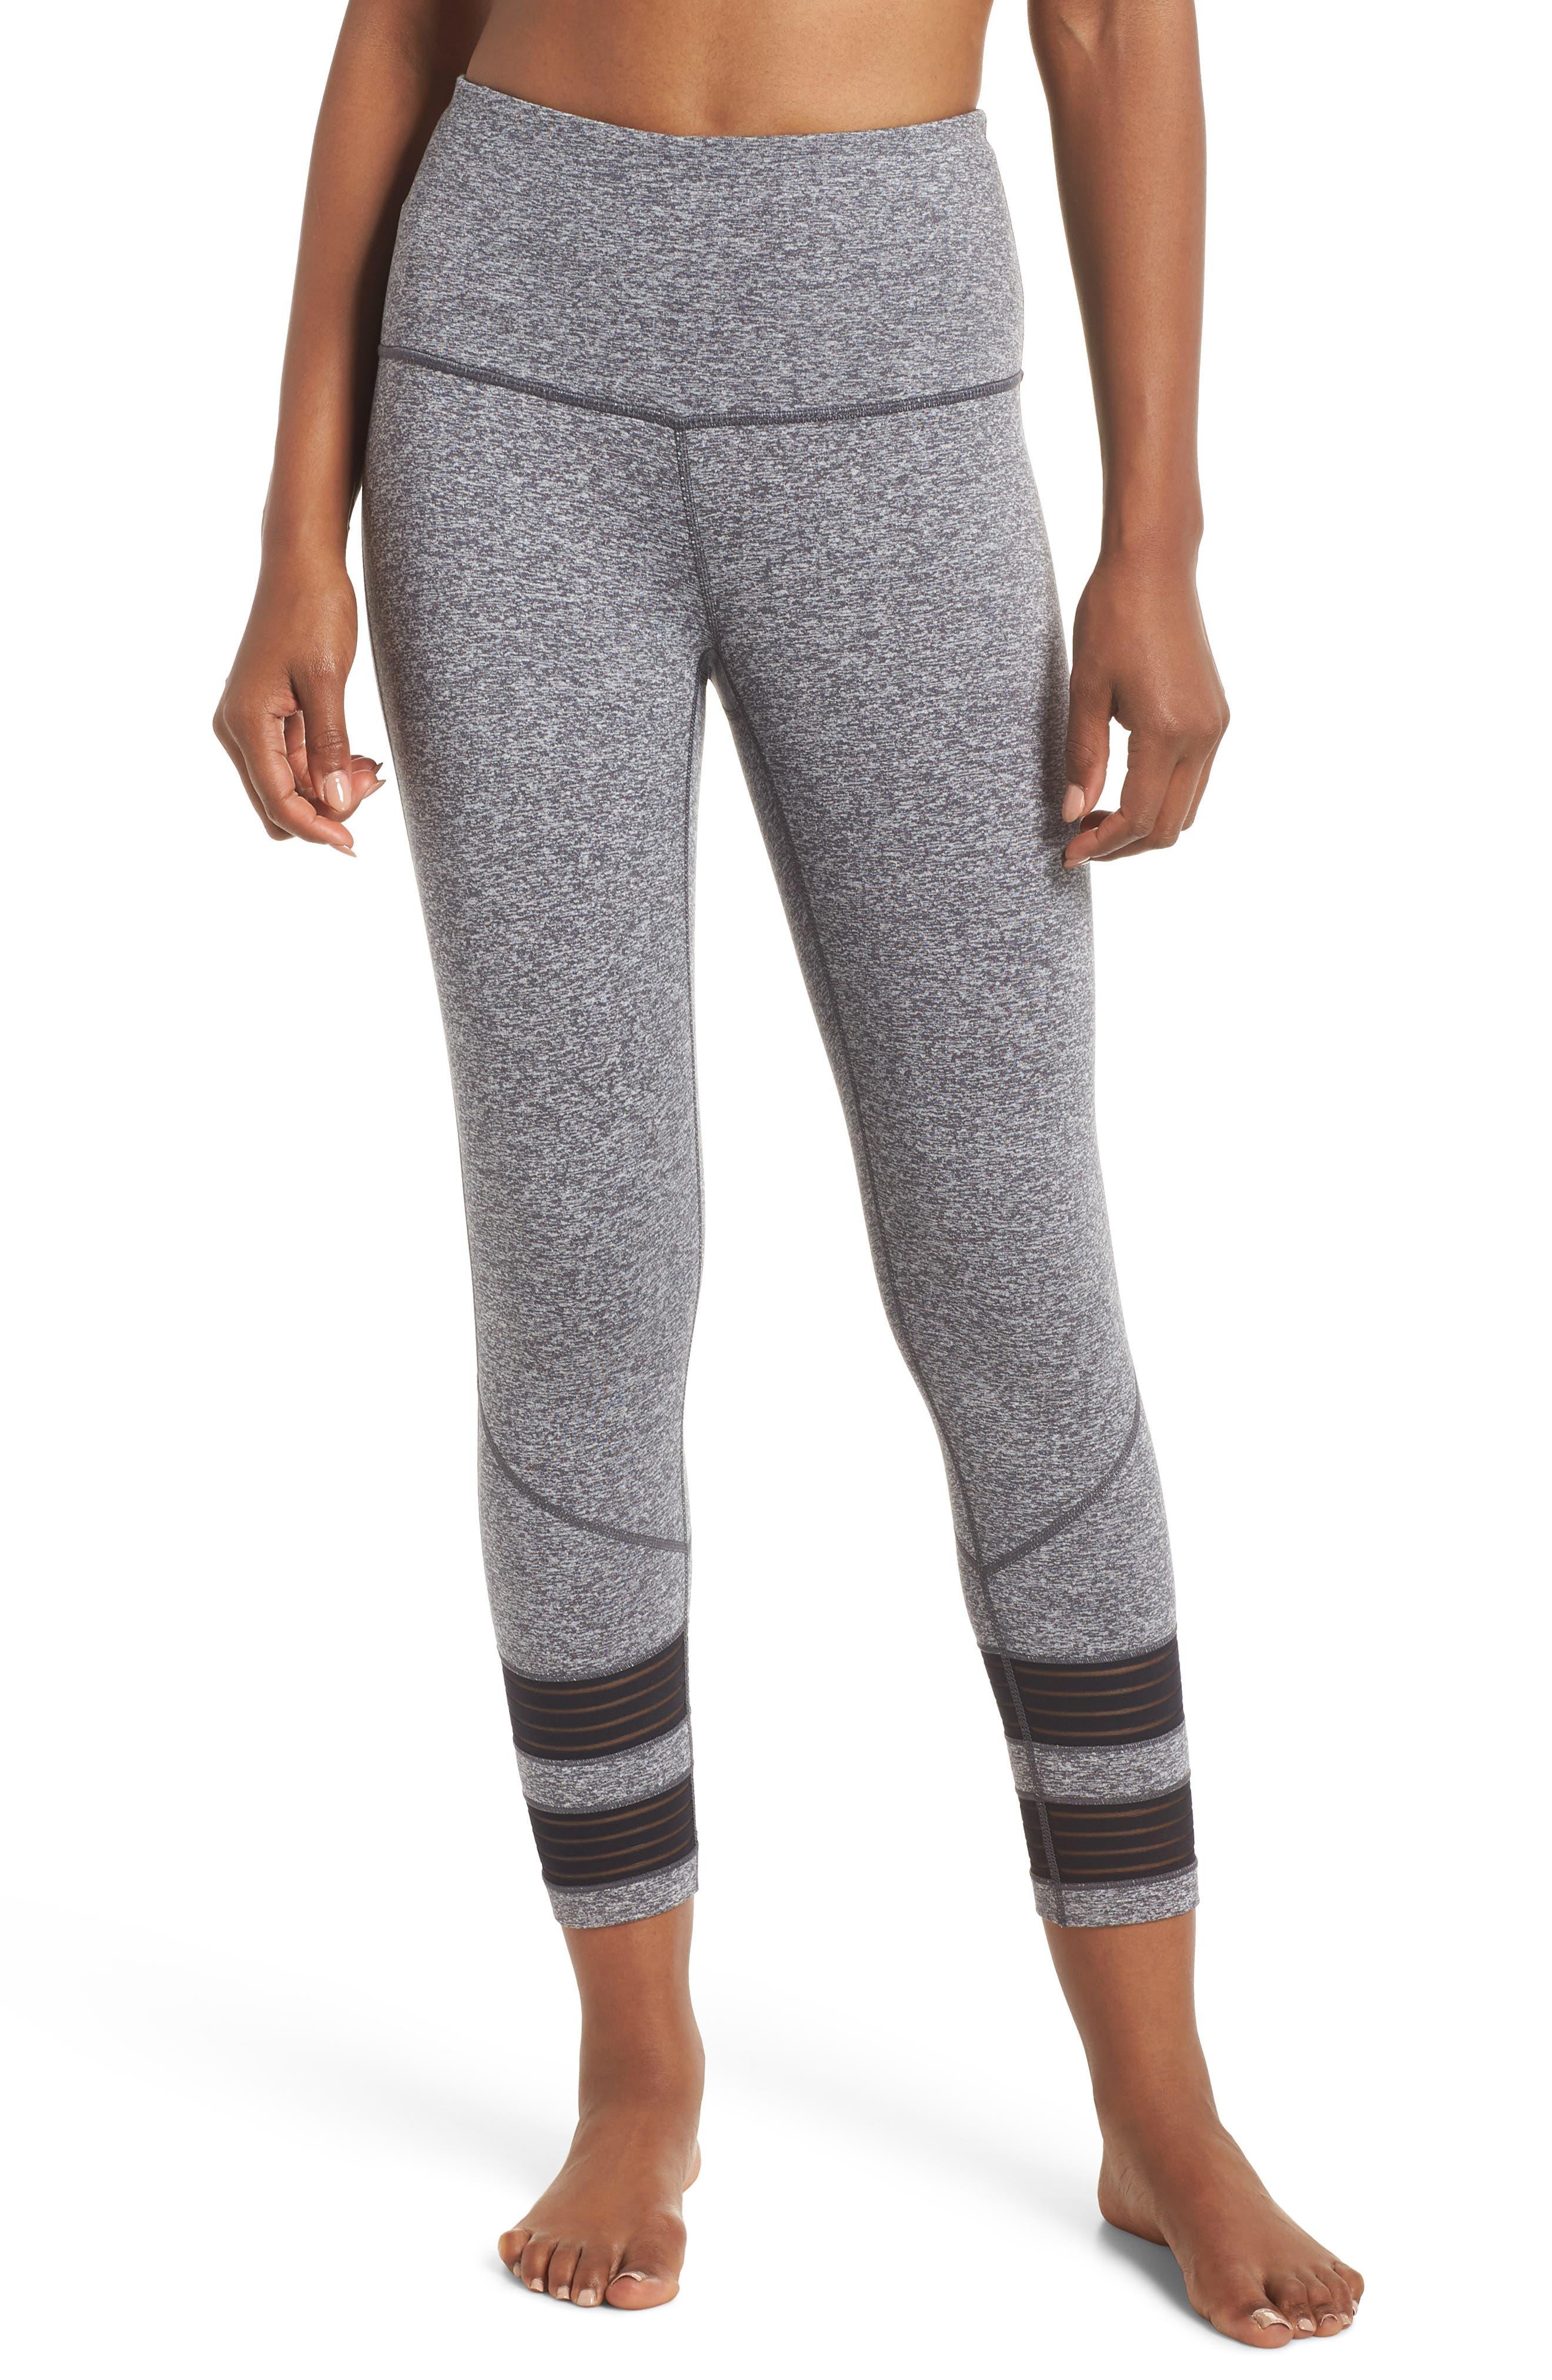 High Waist Twin Crop Leggings,                         Main,                         color, Grey Graphite